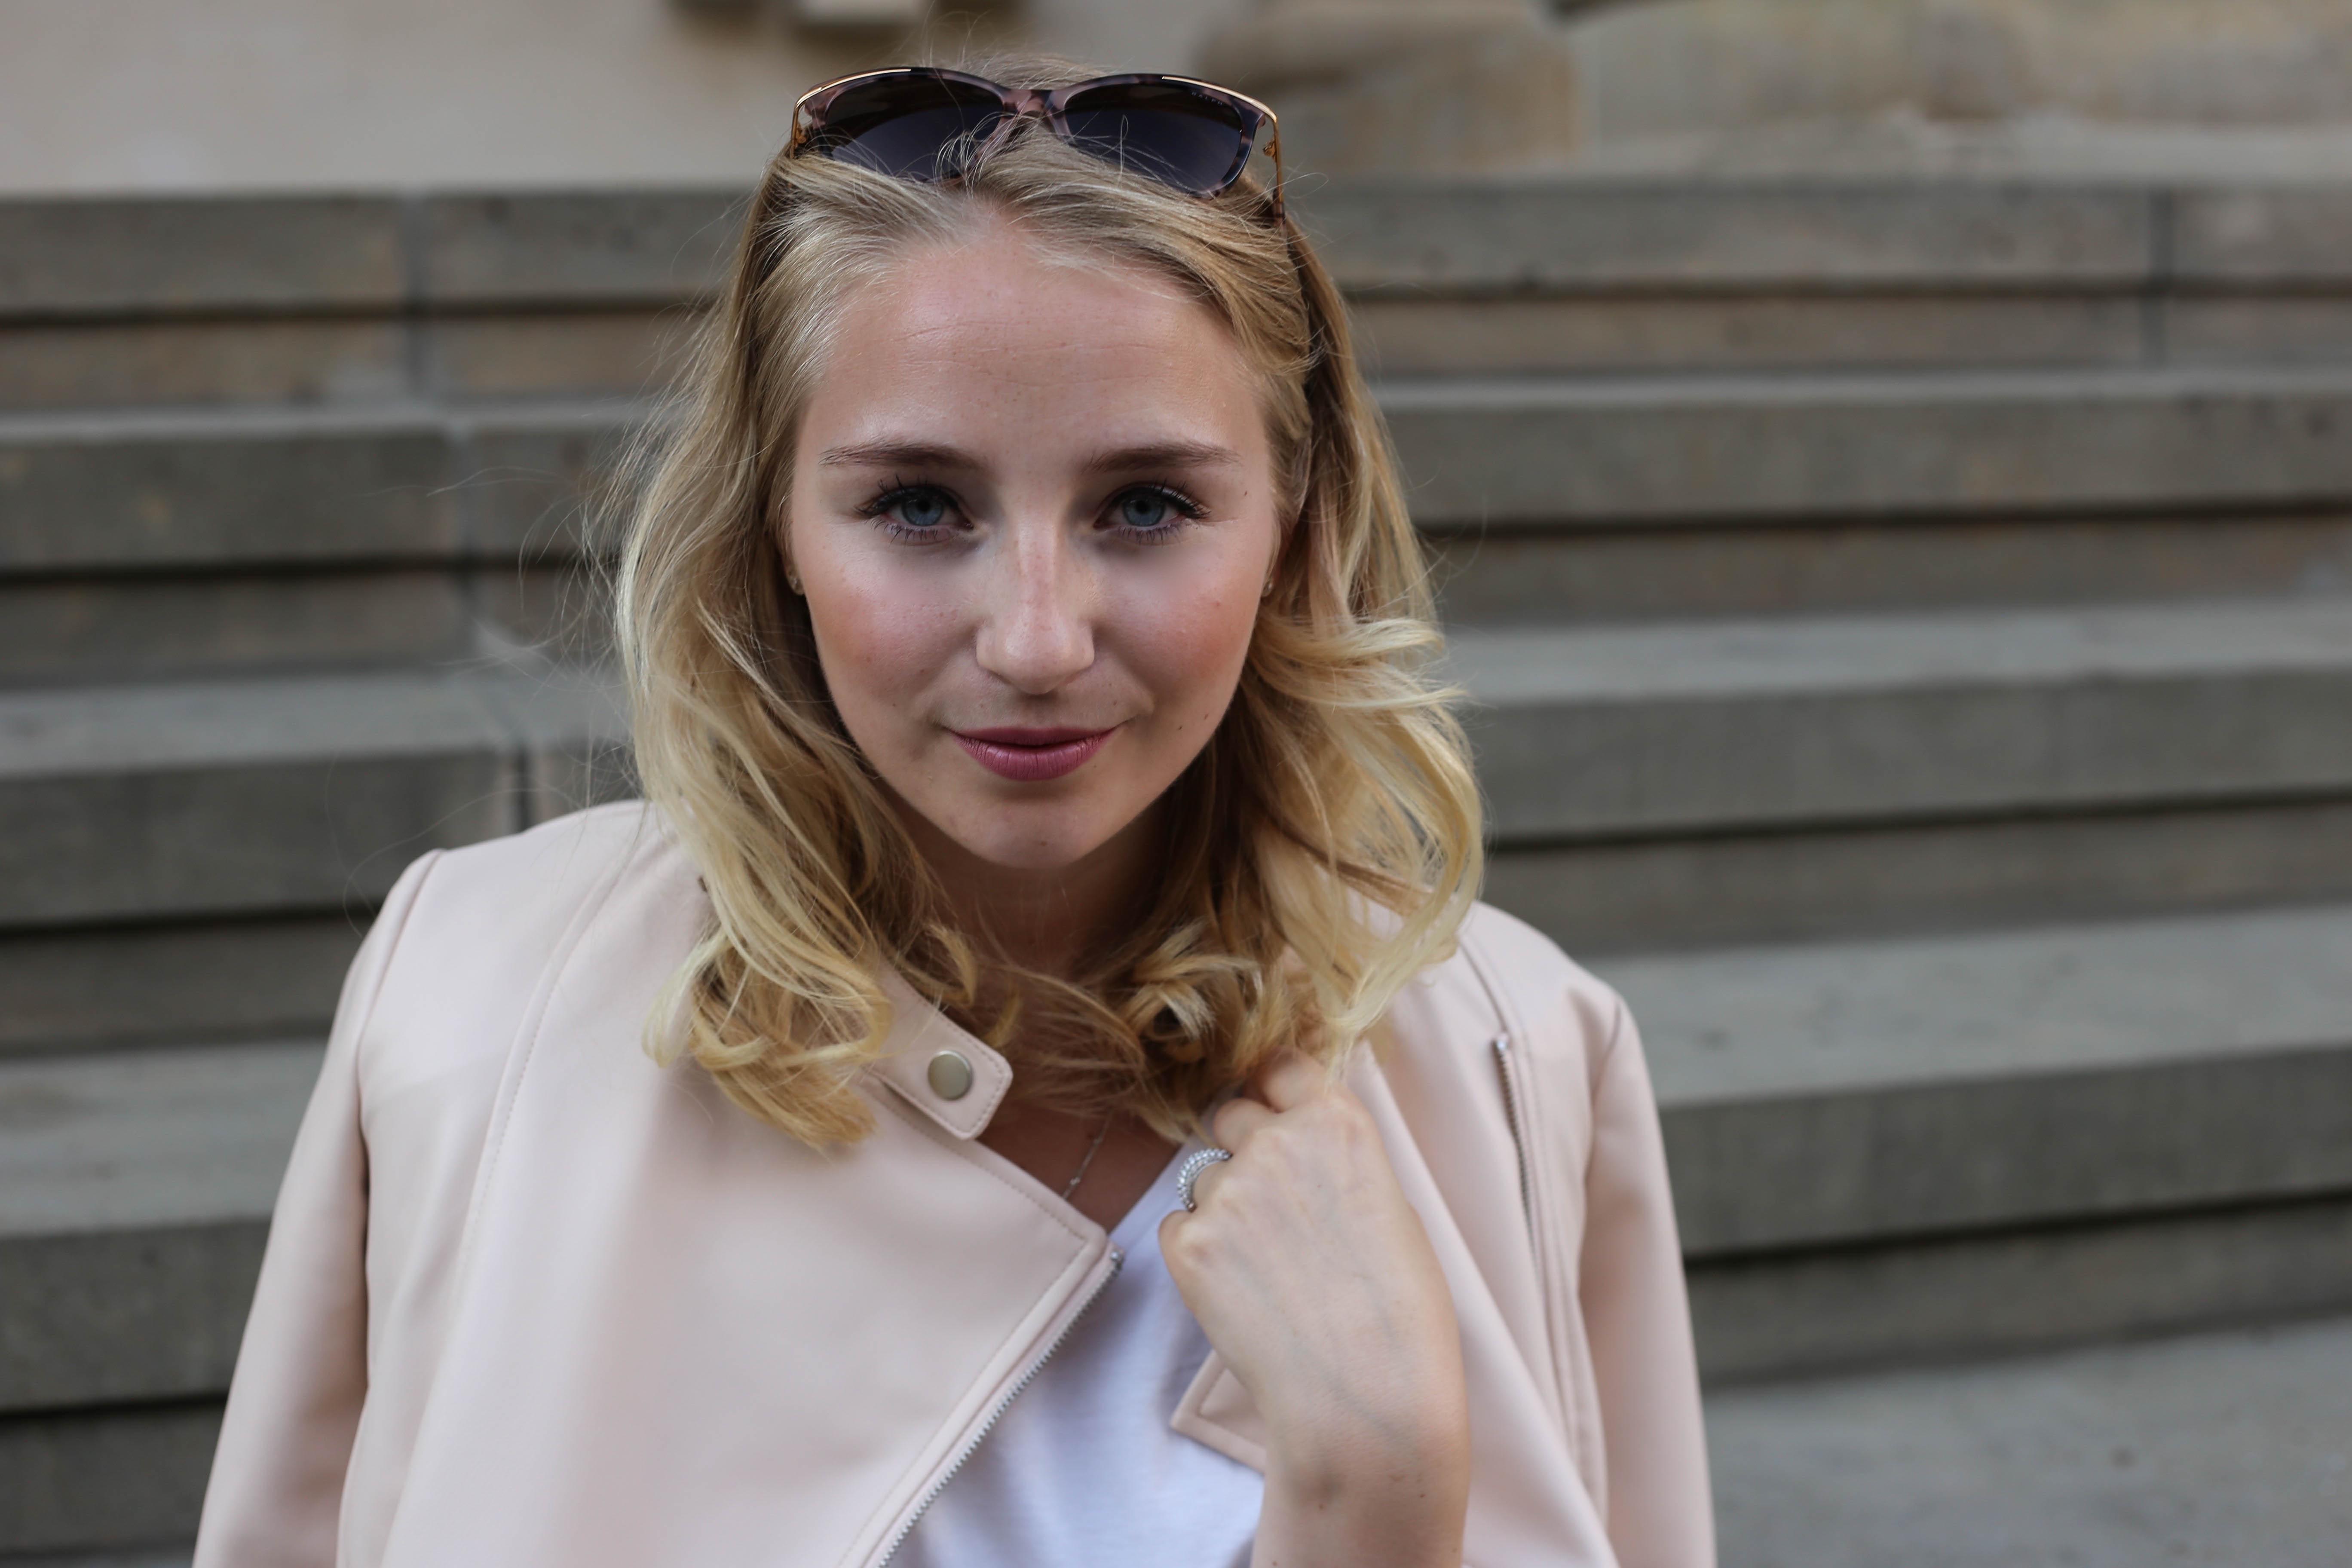 rosa-lederjacke-mango-klotzabsatz-sandalen-fashionblog-berlin-mode-blog-outfit_2387 (1)